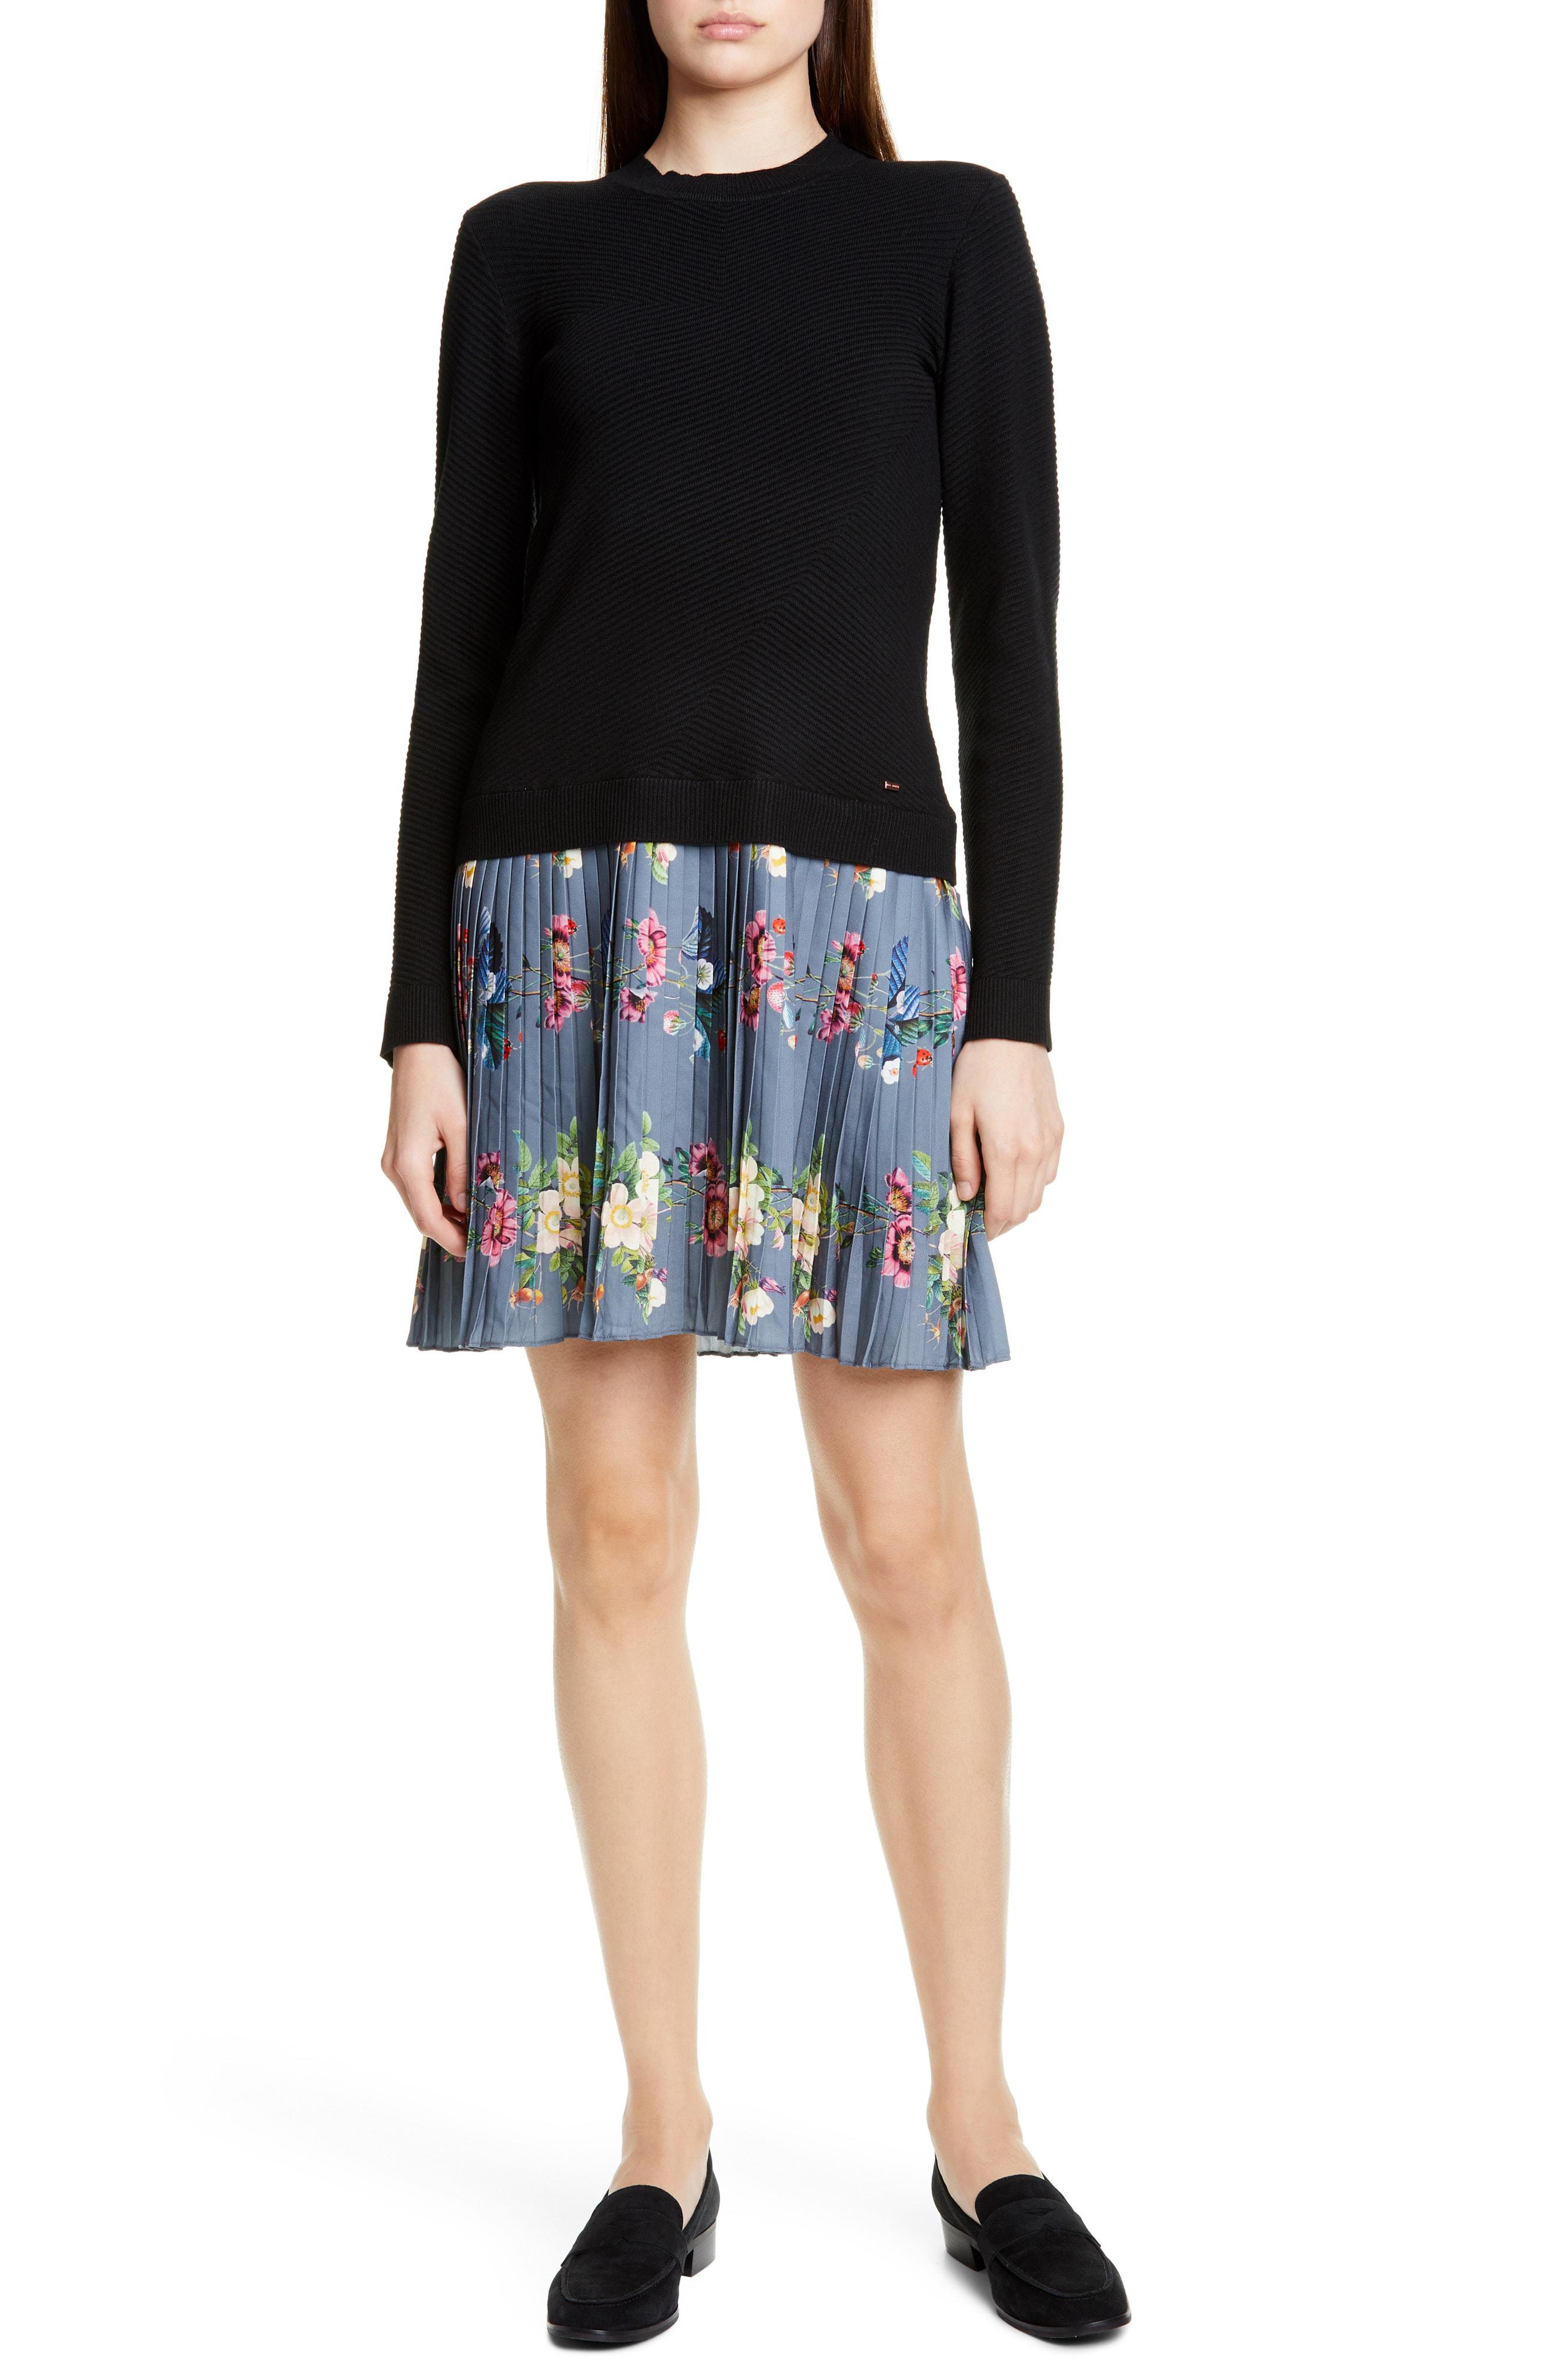 dd76736fd8 Ted Baker Izitaa Oracle Long Sleeve Pleat Skirt Dress In Black ...